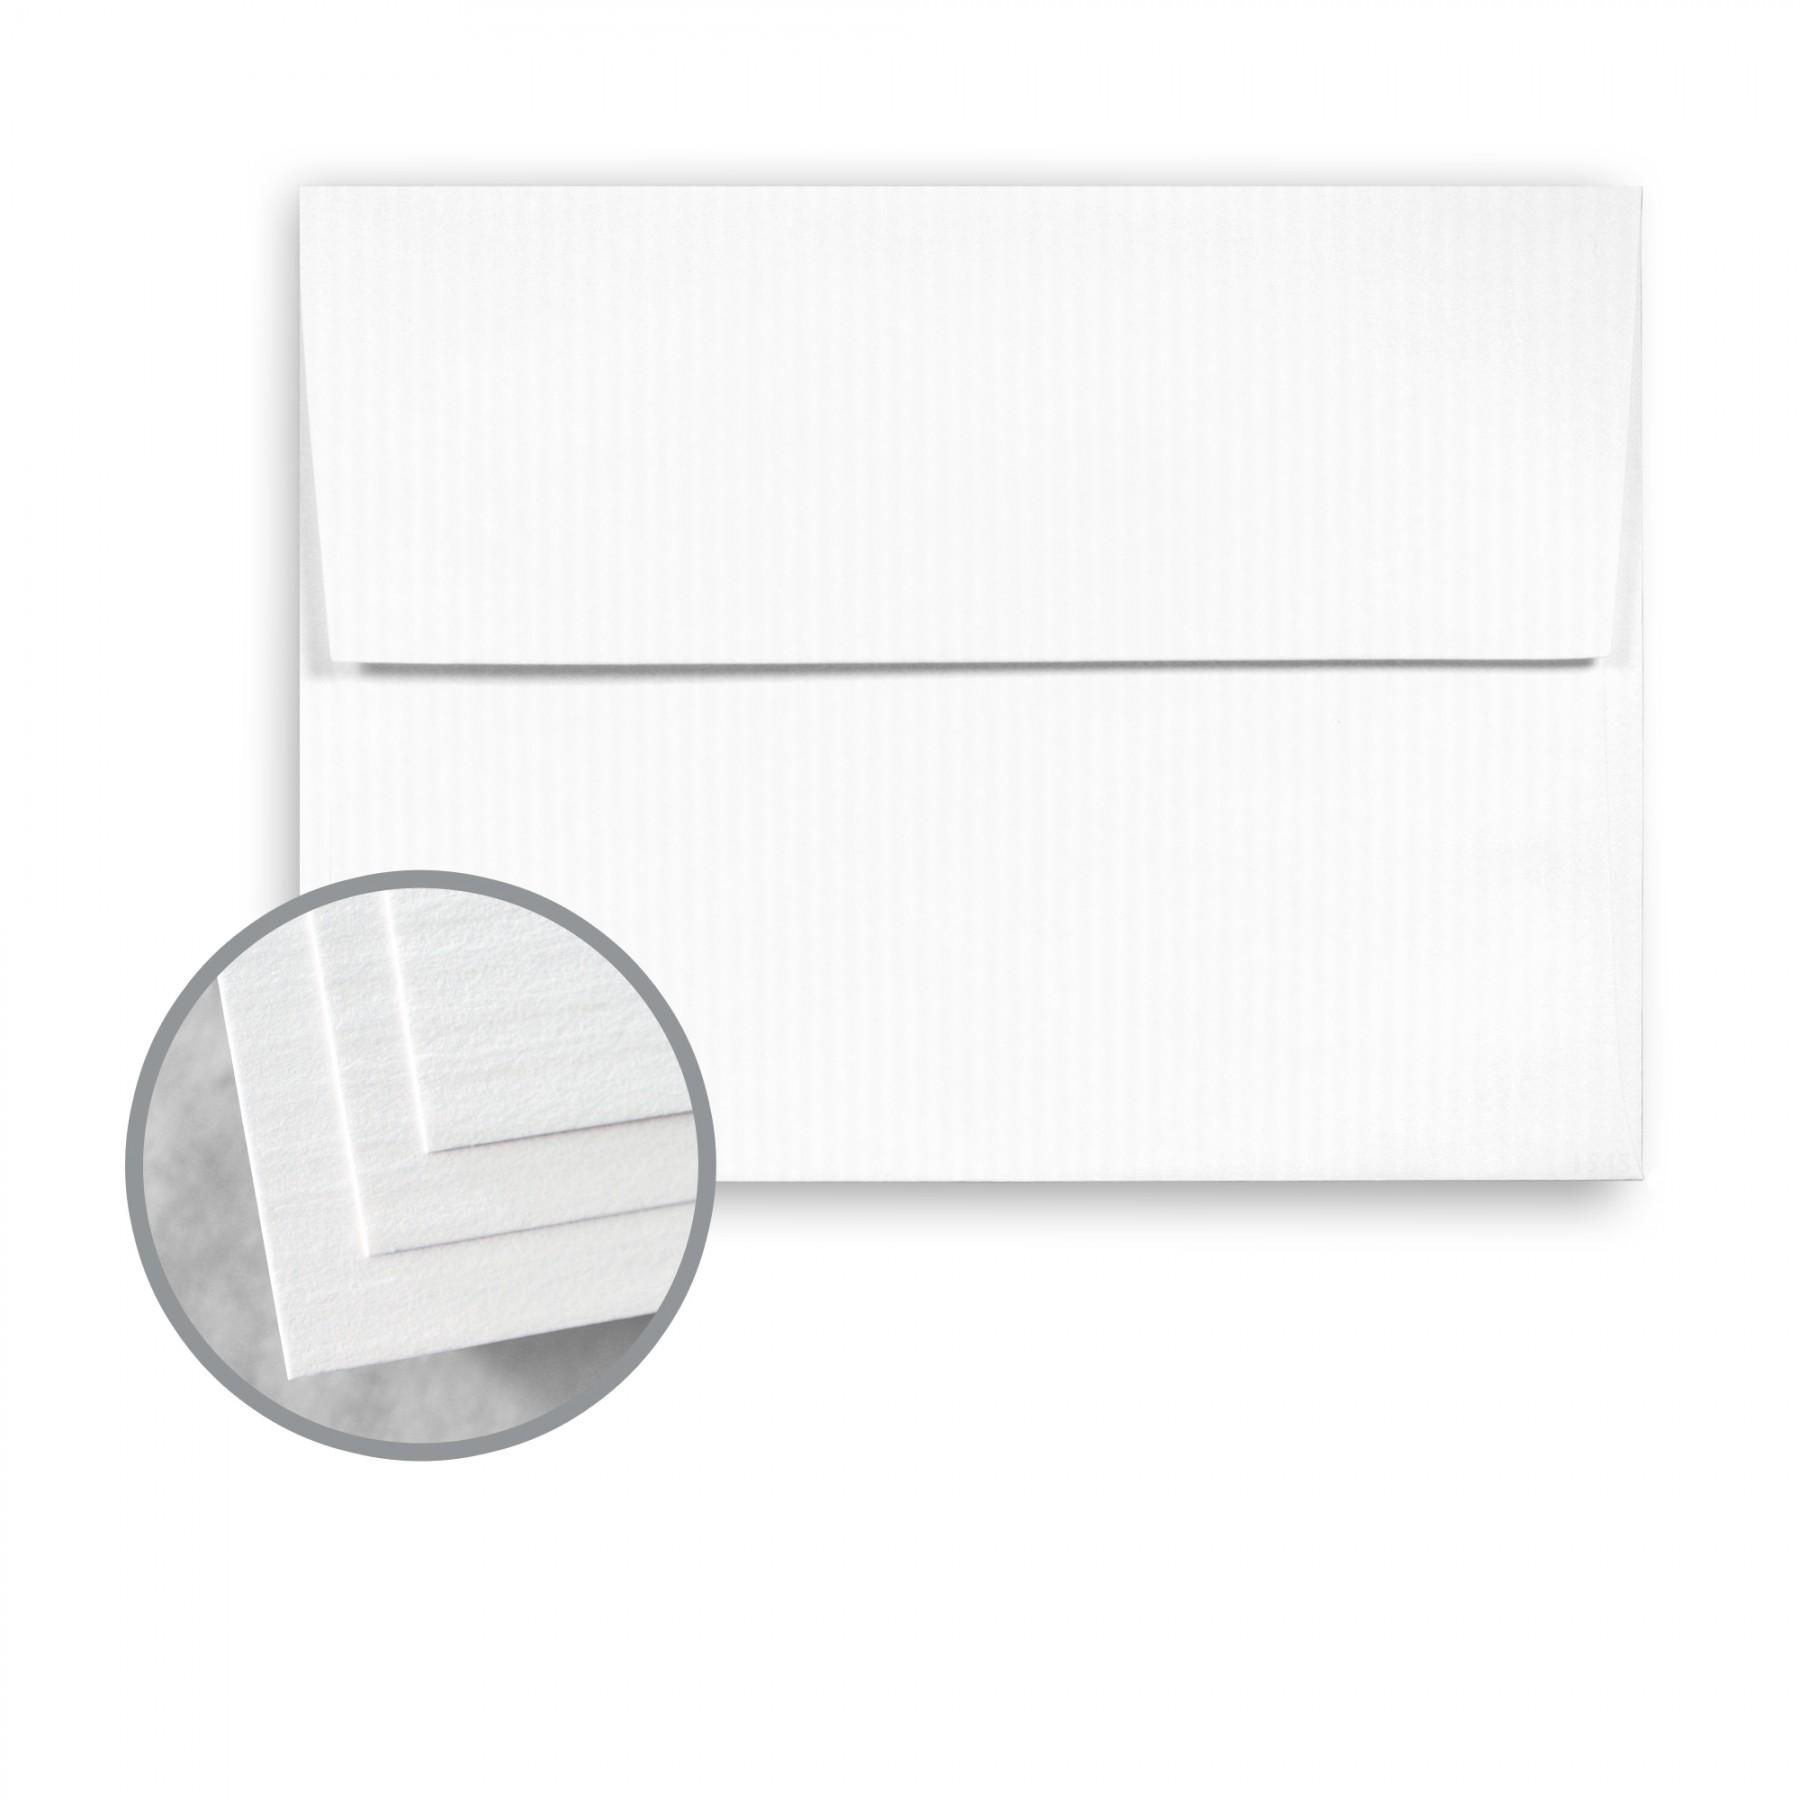 Solar White Envelopes A7 5 1 4 X 7 1 4 80 Lb Text